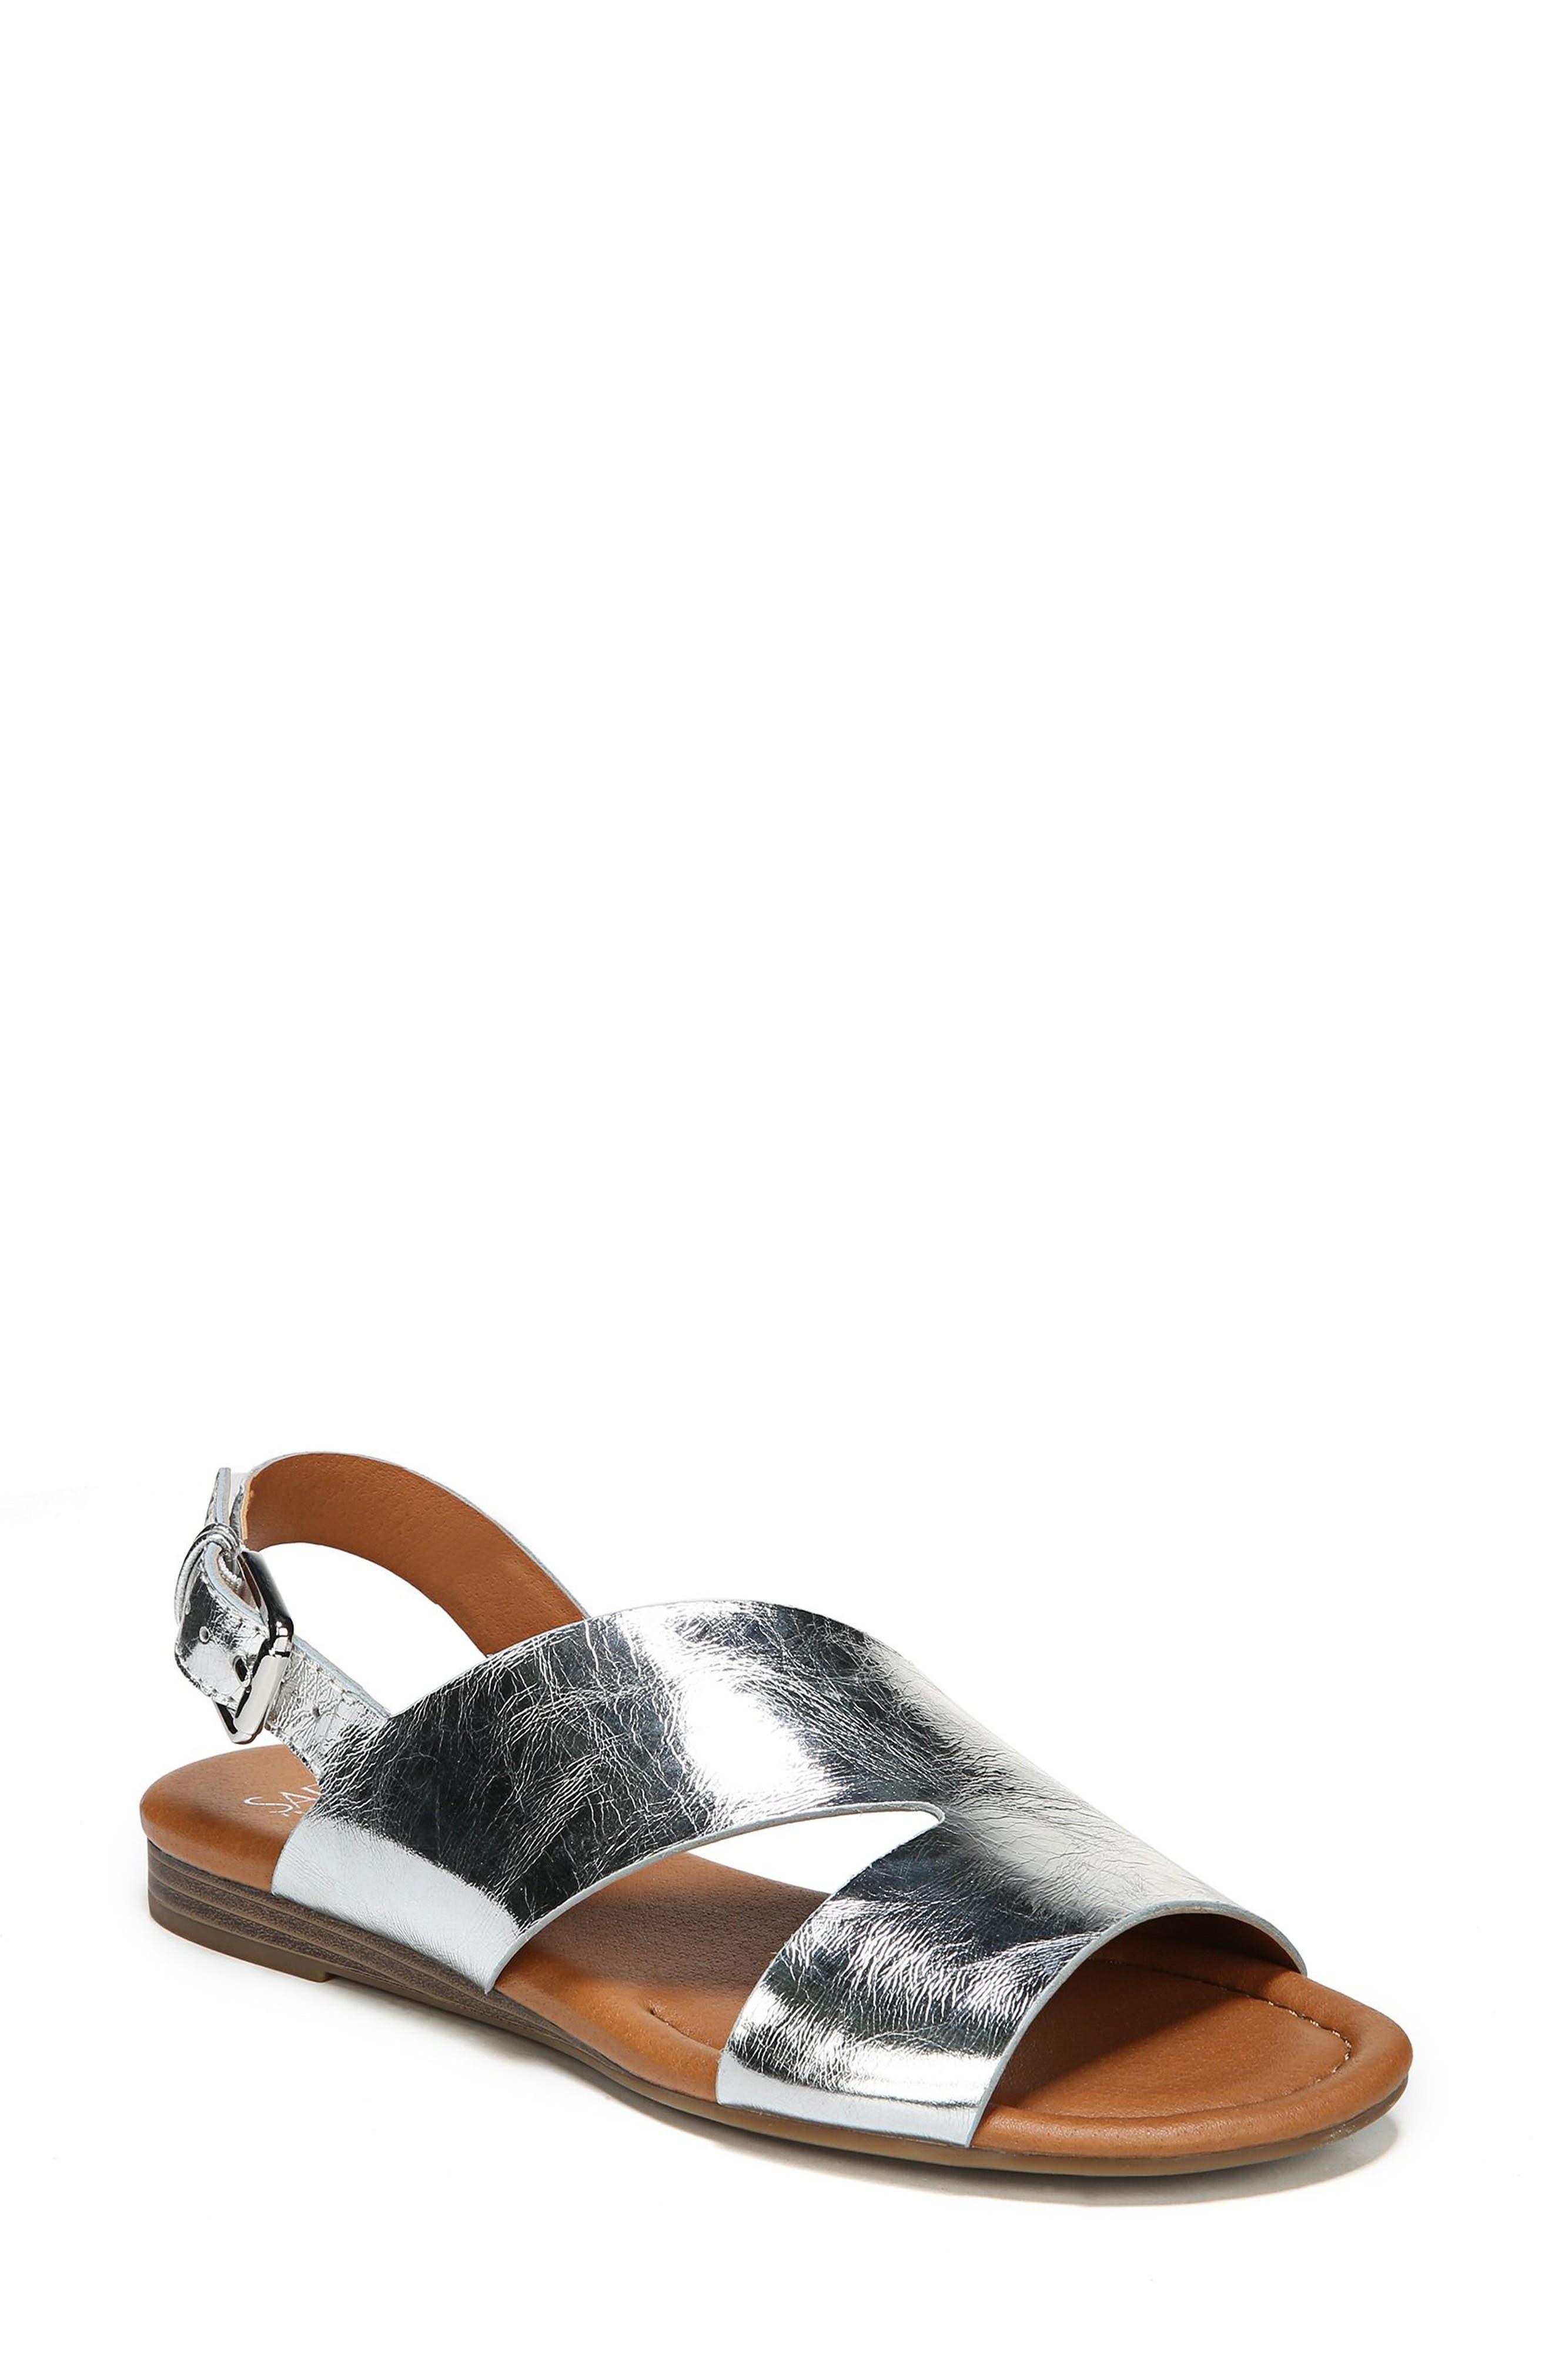 Garza Slingback Sandal,                         Main,                         color, ARGENTO LEATHER